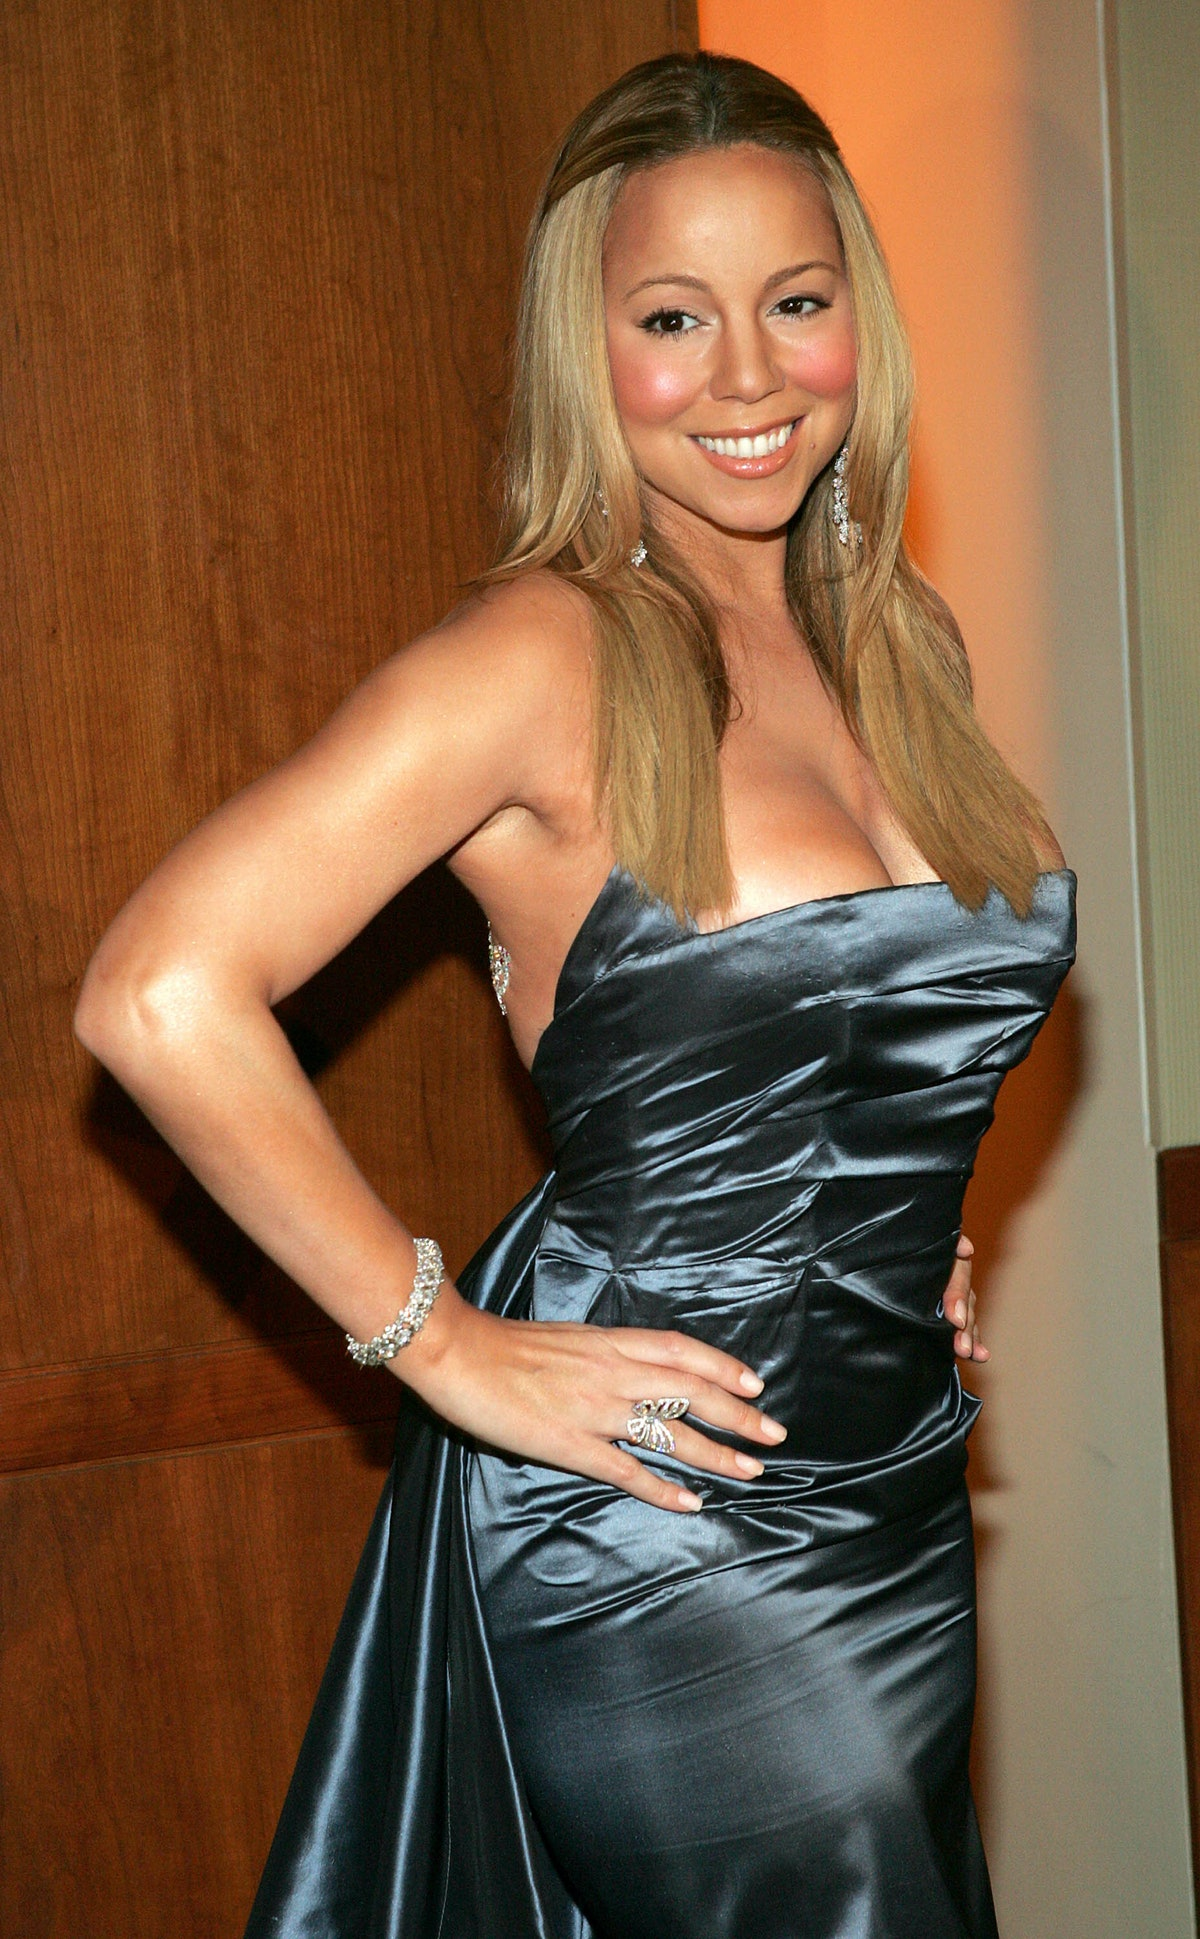 Mariah Carey showcasing heavy blush in 2004, a staple trend of the decade.